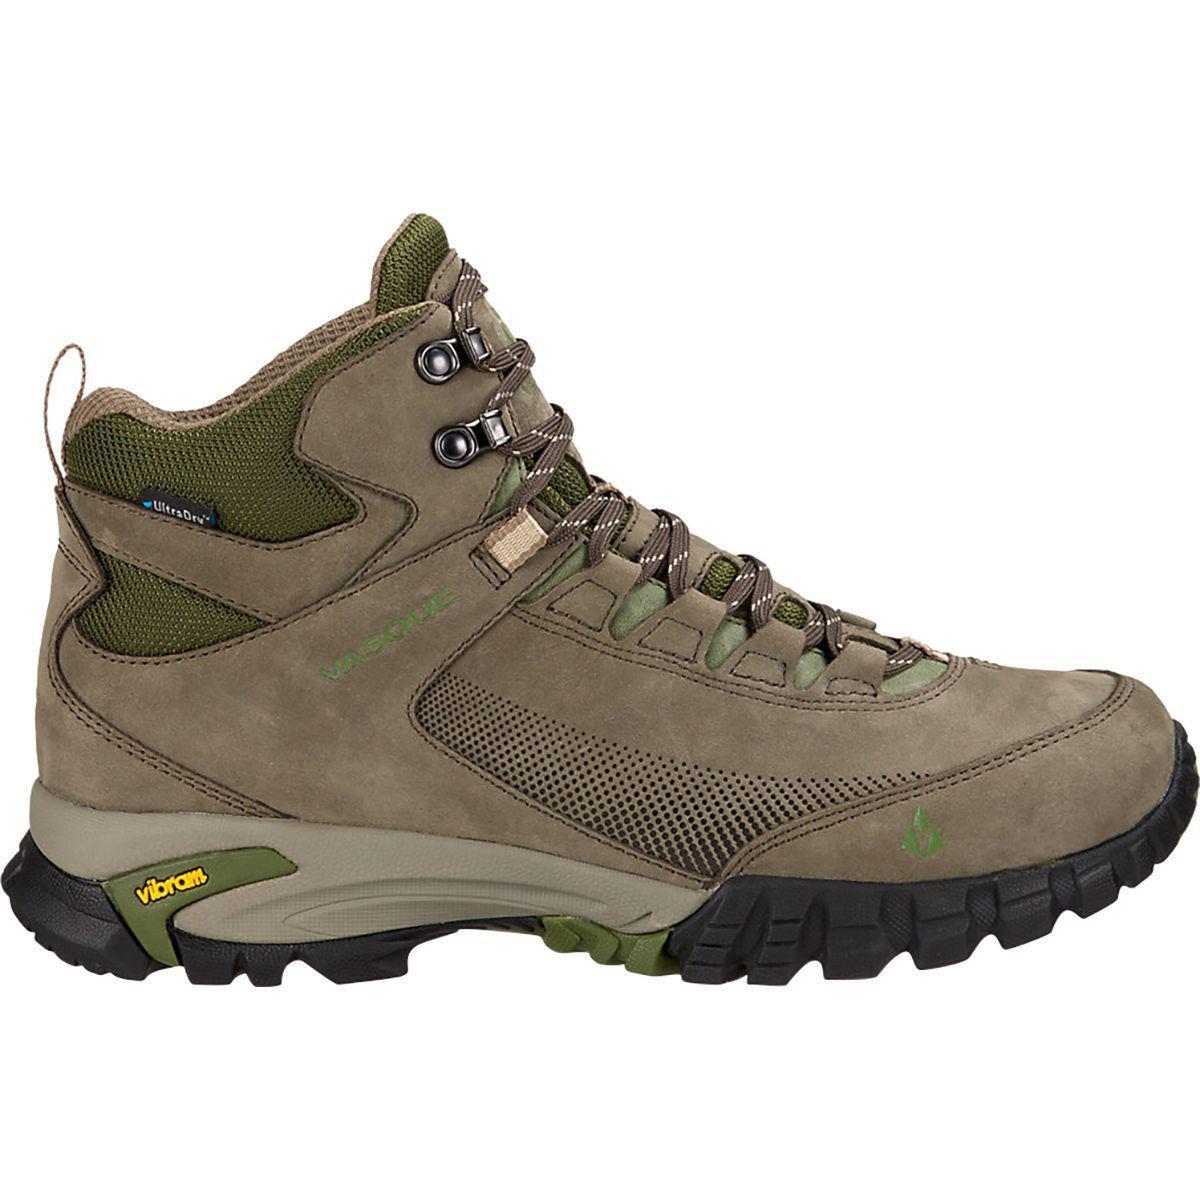 a758d050f2c Lyst - Vasque Talus Trek Ultradry Hiking Boot for Men